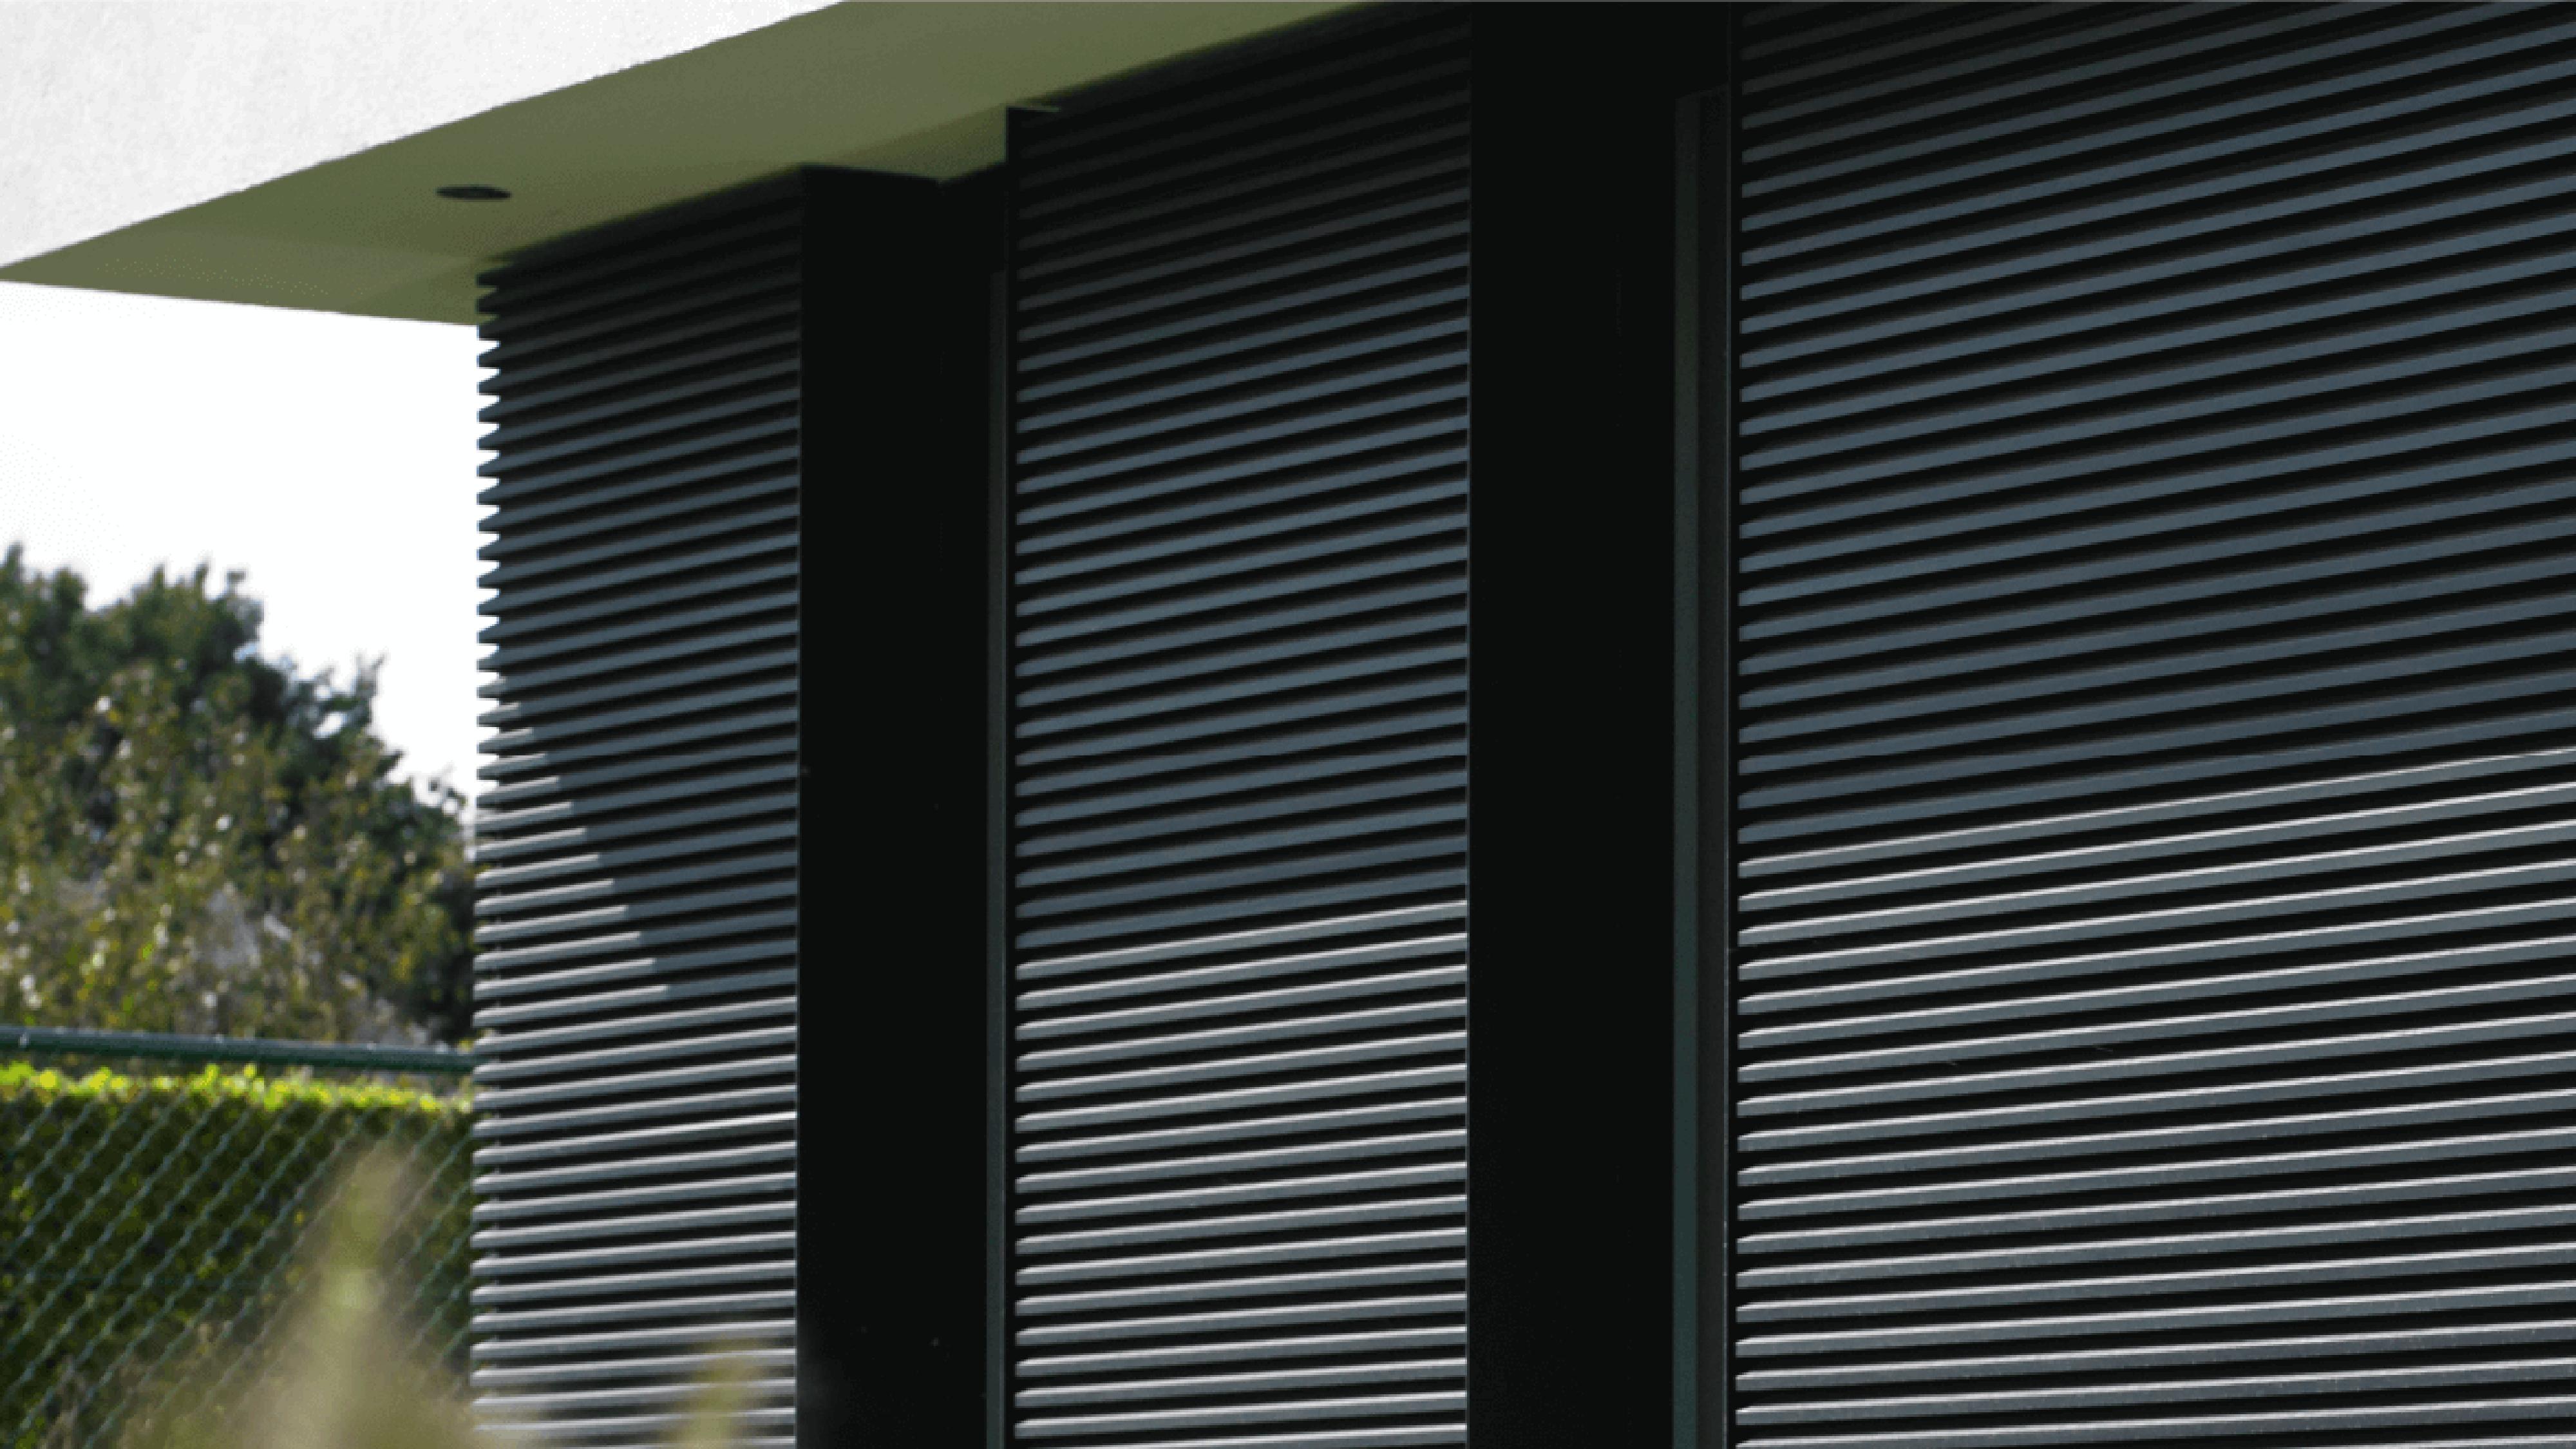 Alu-Wall Horizontale Open Gevelbekleding